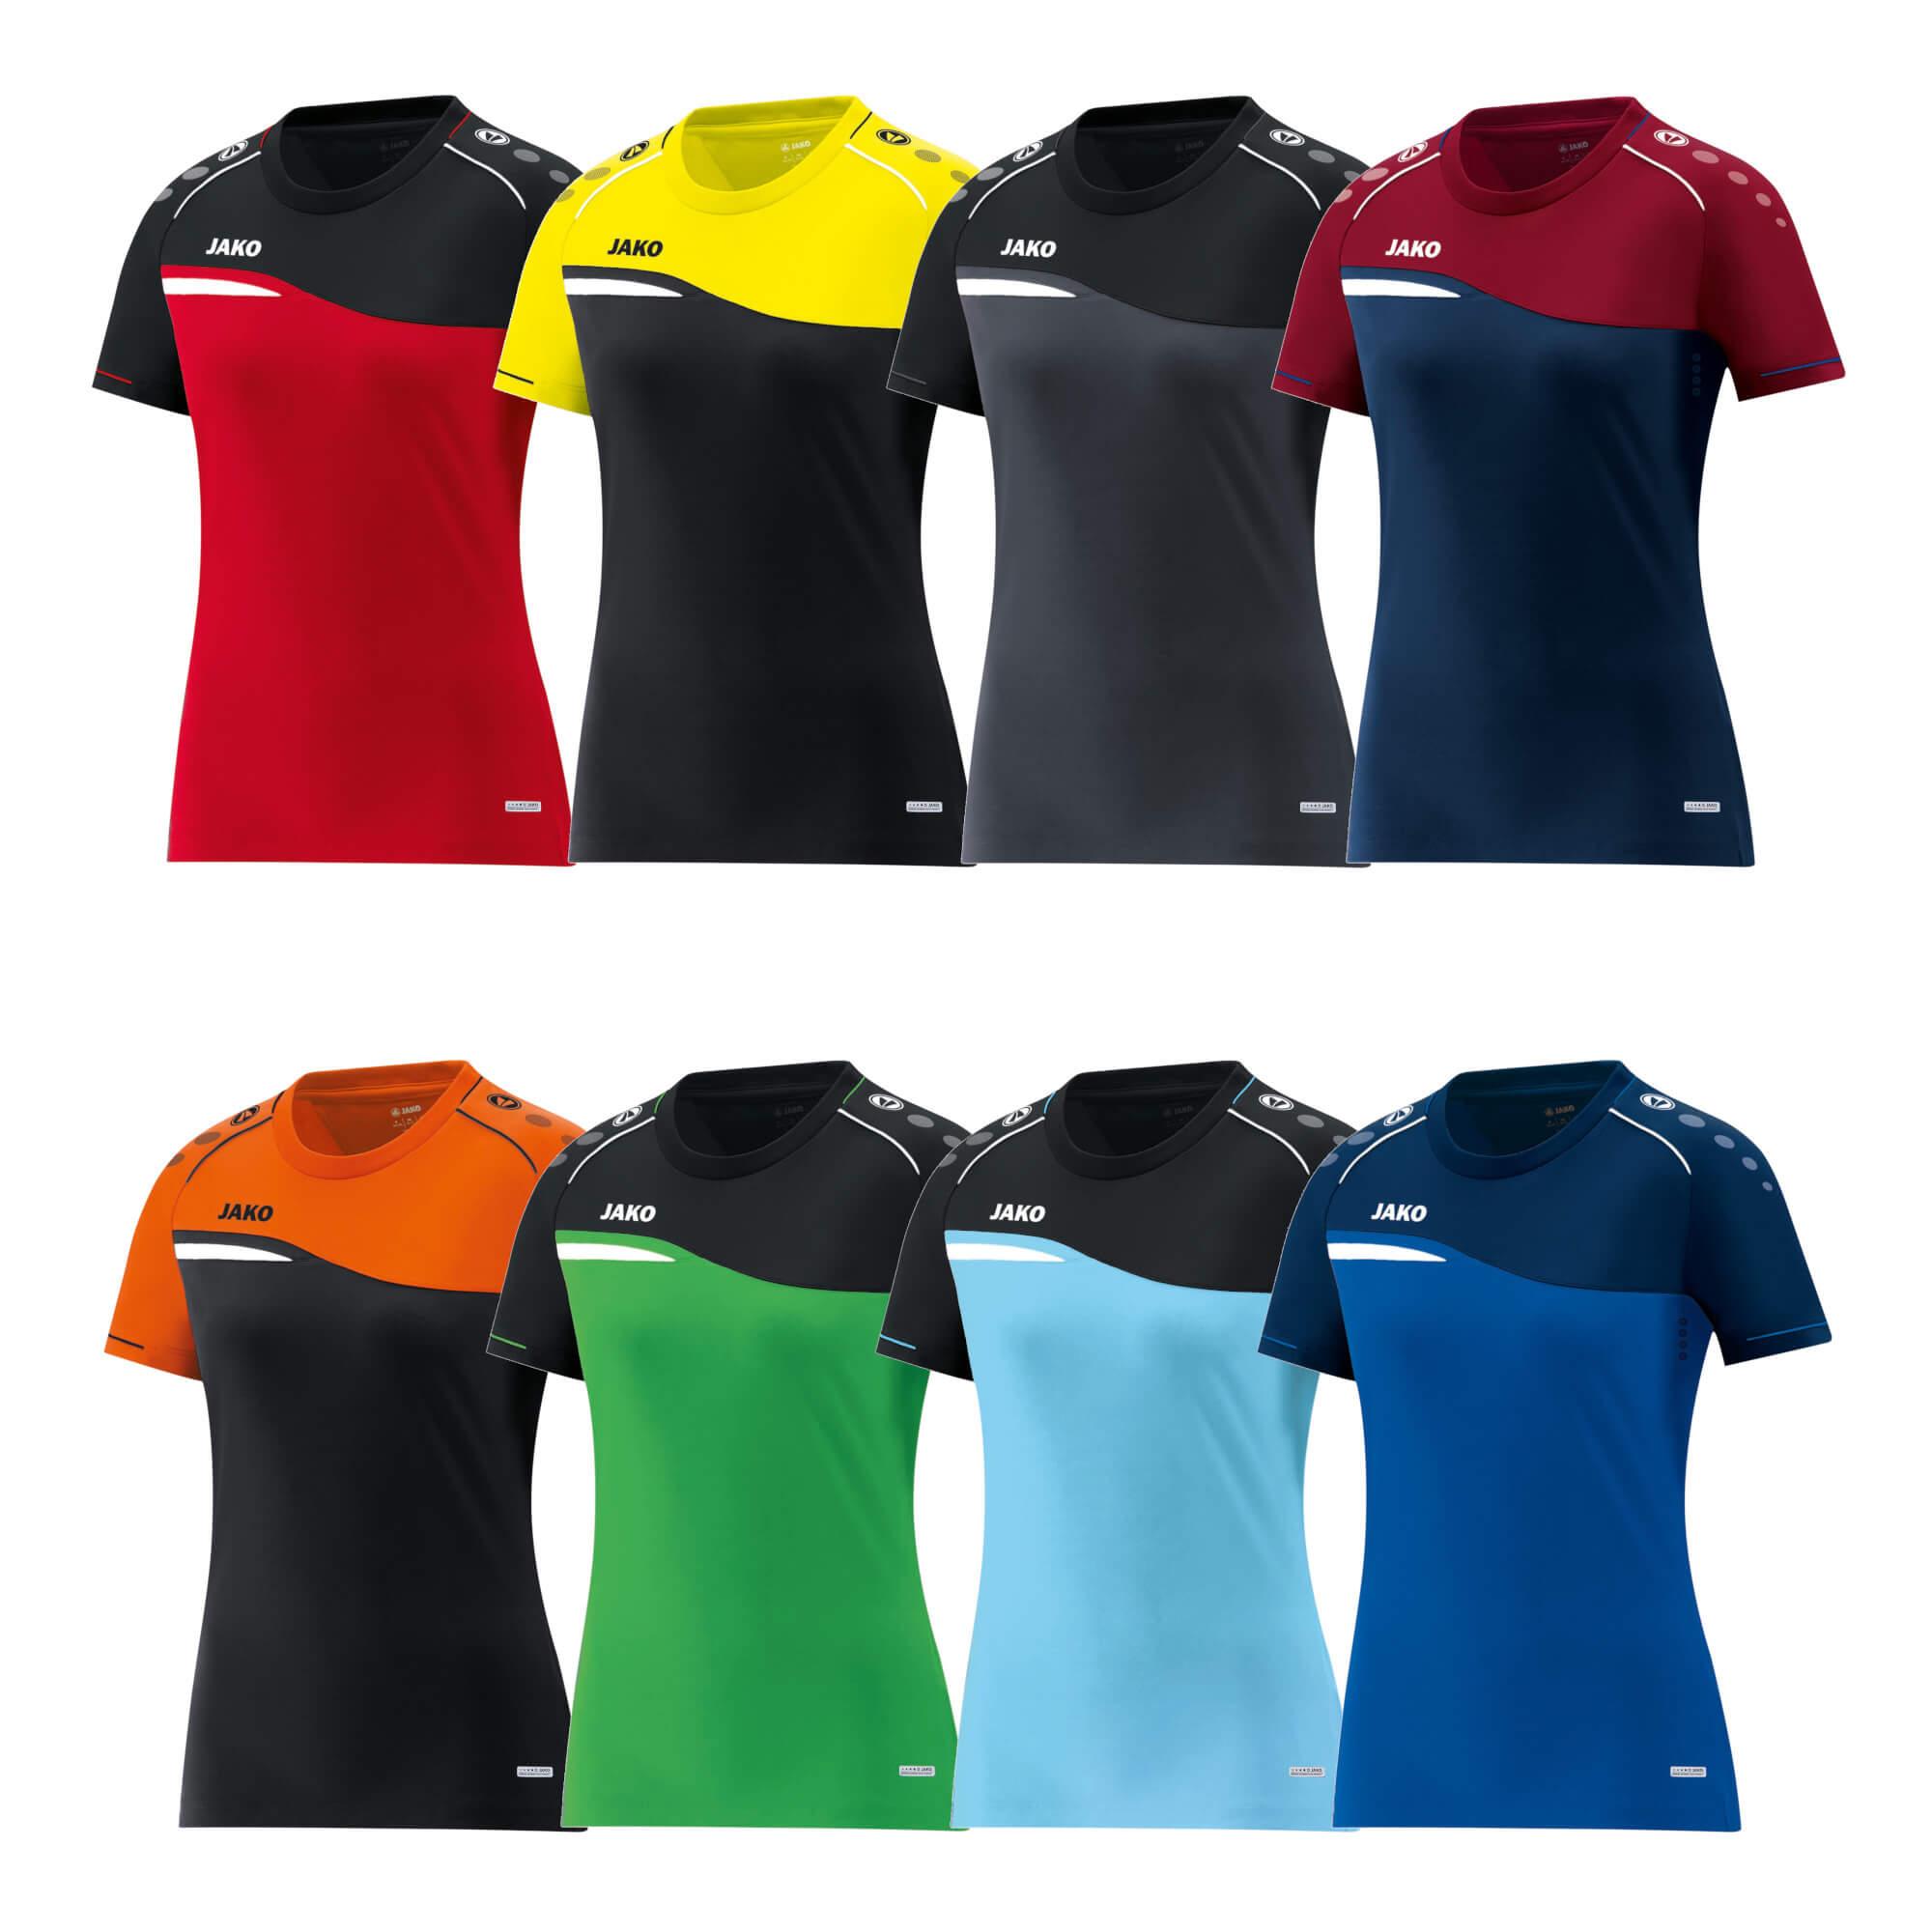 f61091fd08e438 JAKO Damen T-Shirt Competition 2.0 6118 | Vision sports Teamsportbedarf